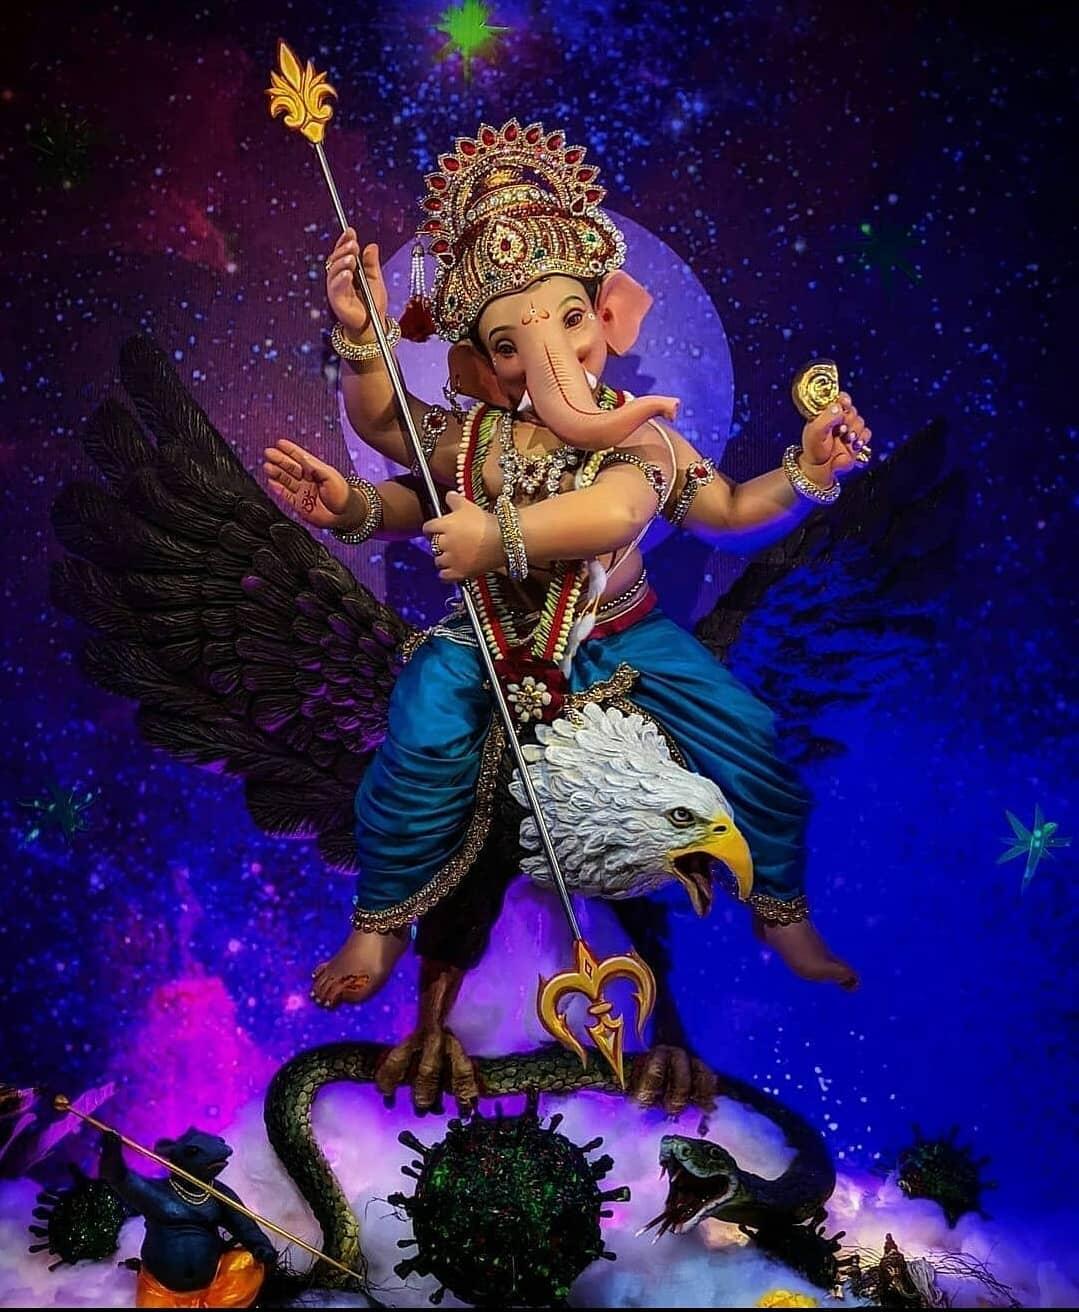 Ganpati Decoration Mandal Images HD Free Download